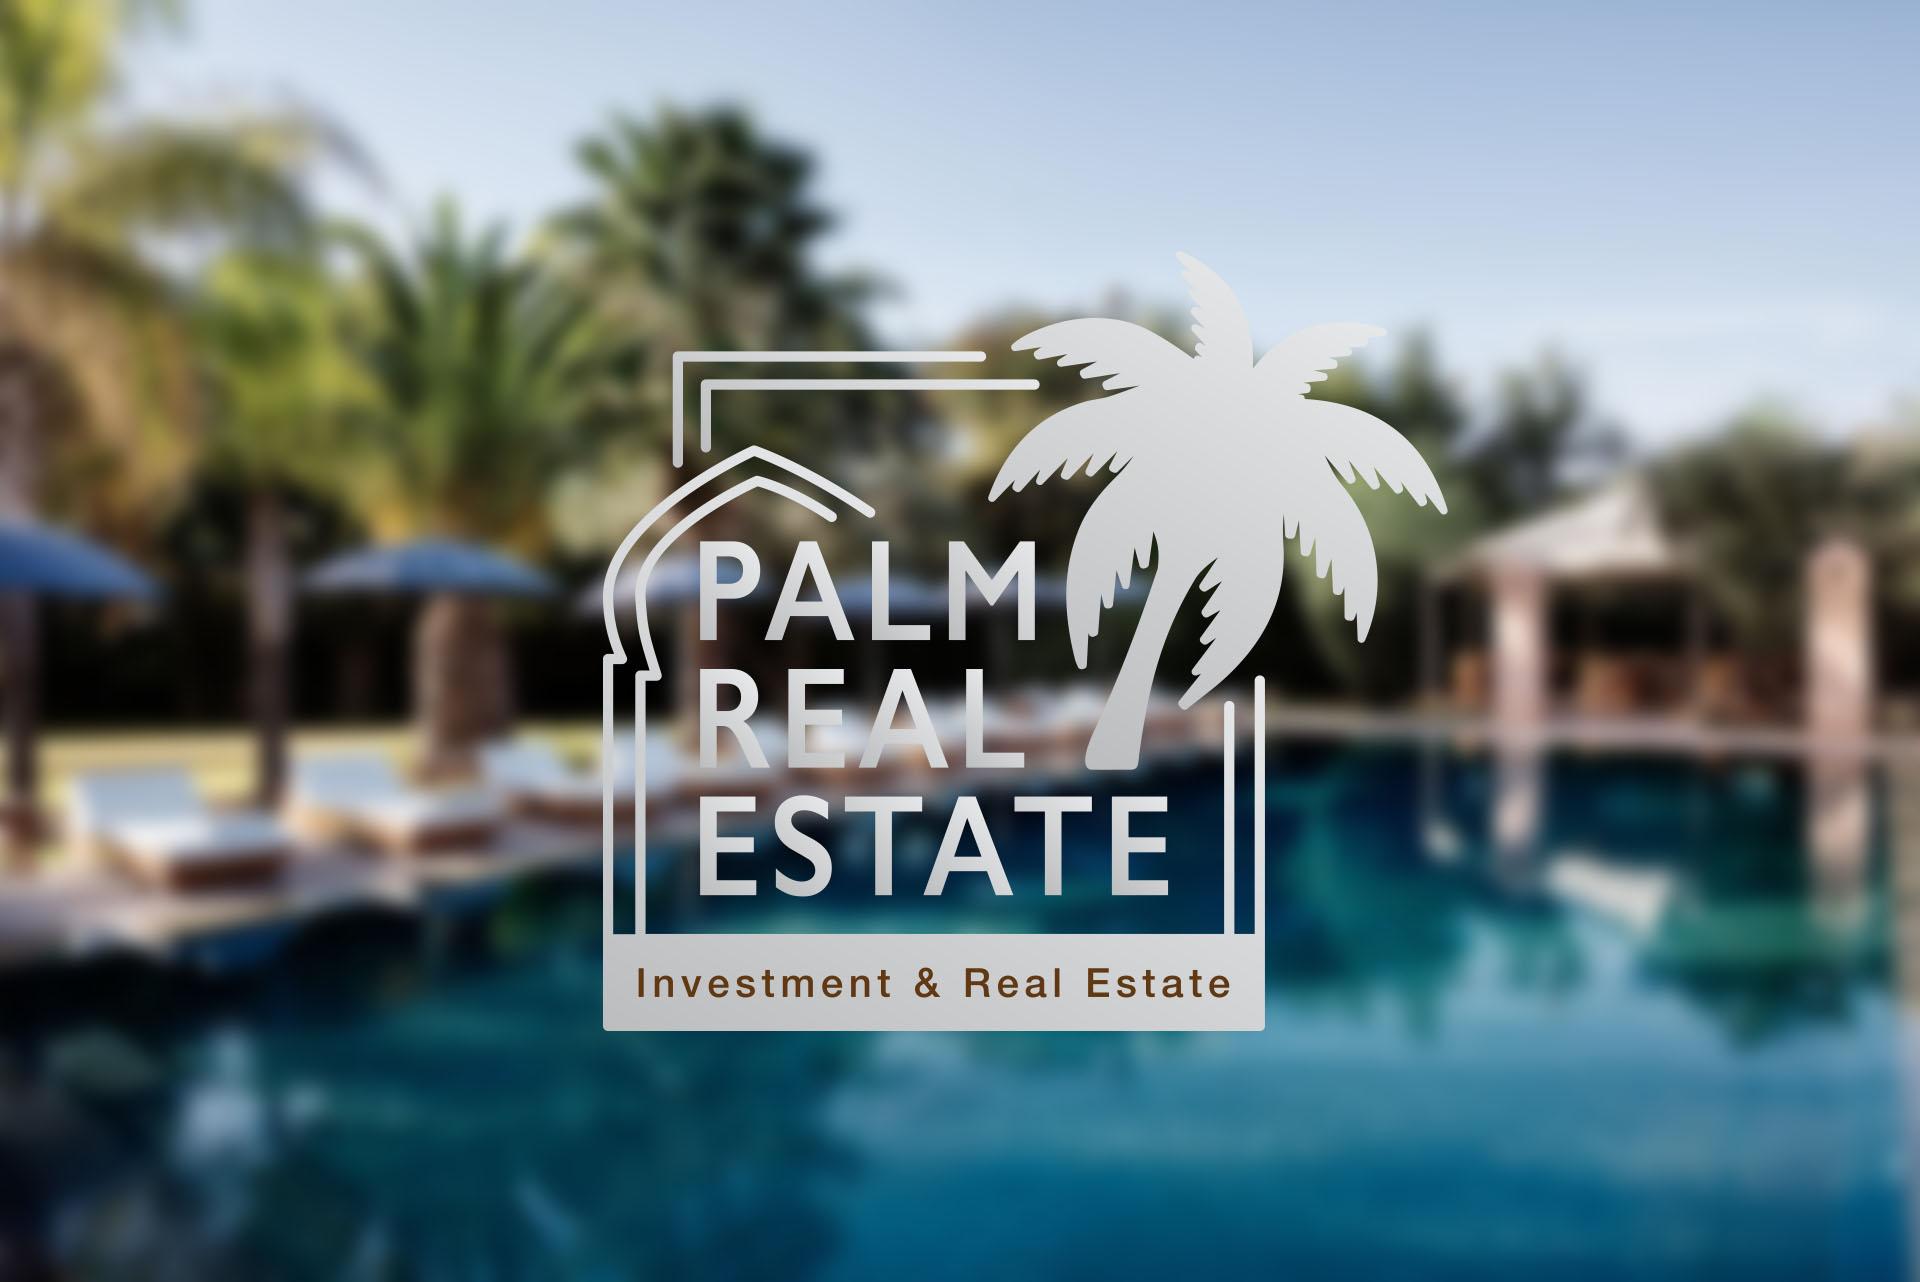 Agence immobilière Marrakech Palm Real Estate